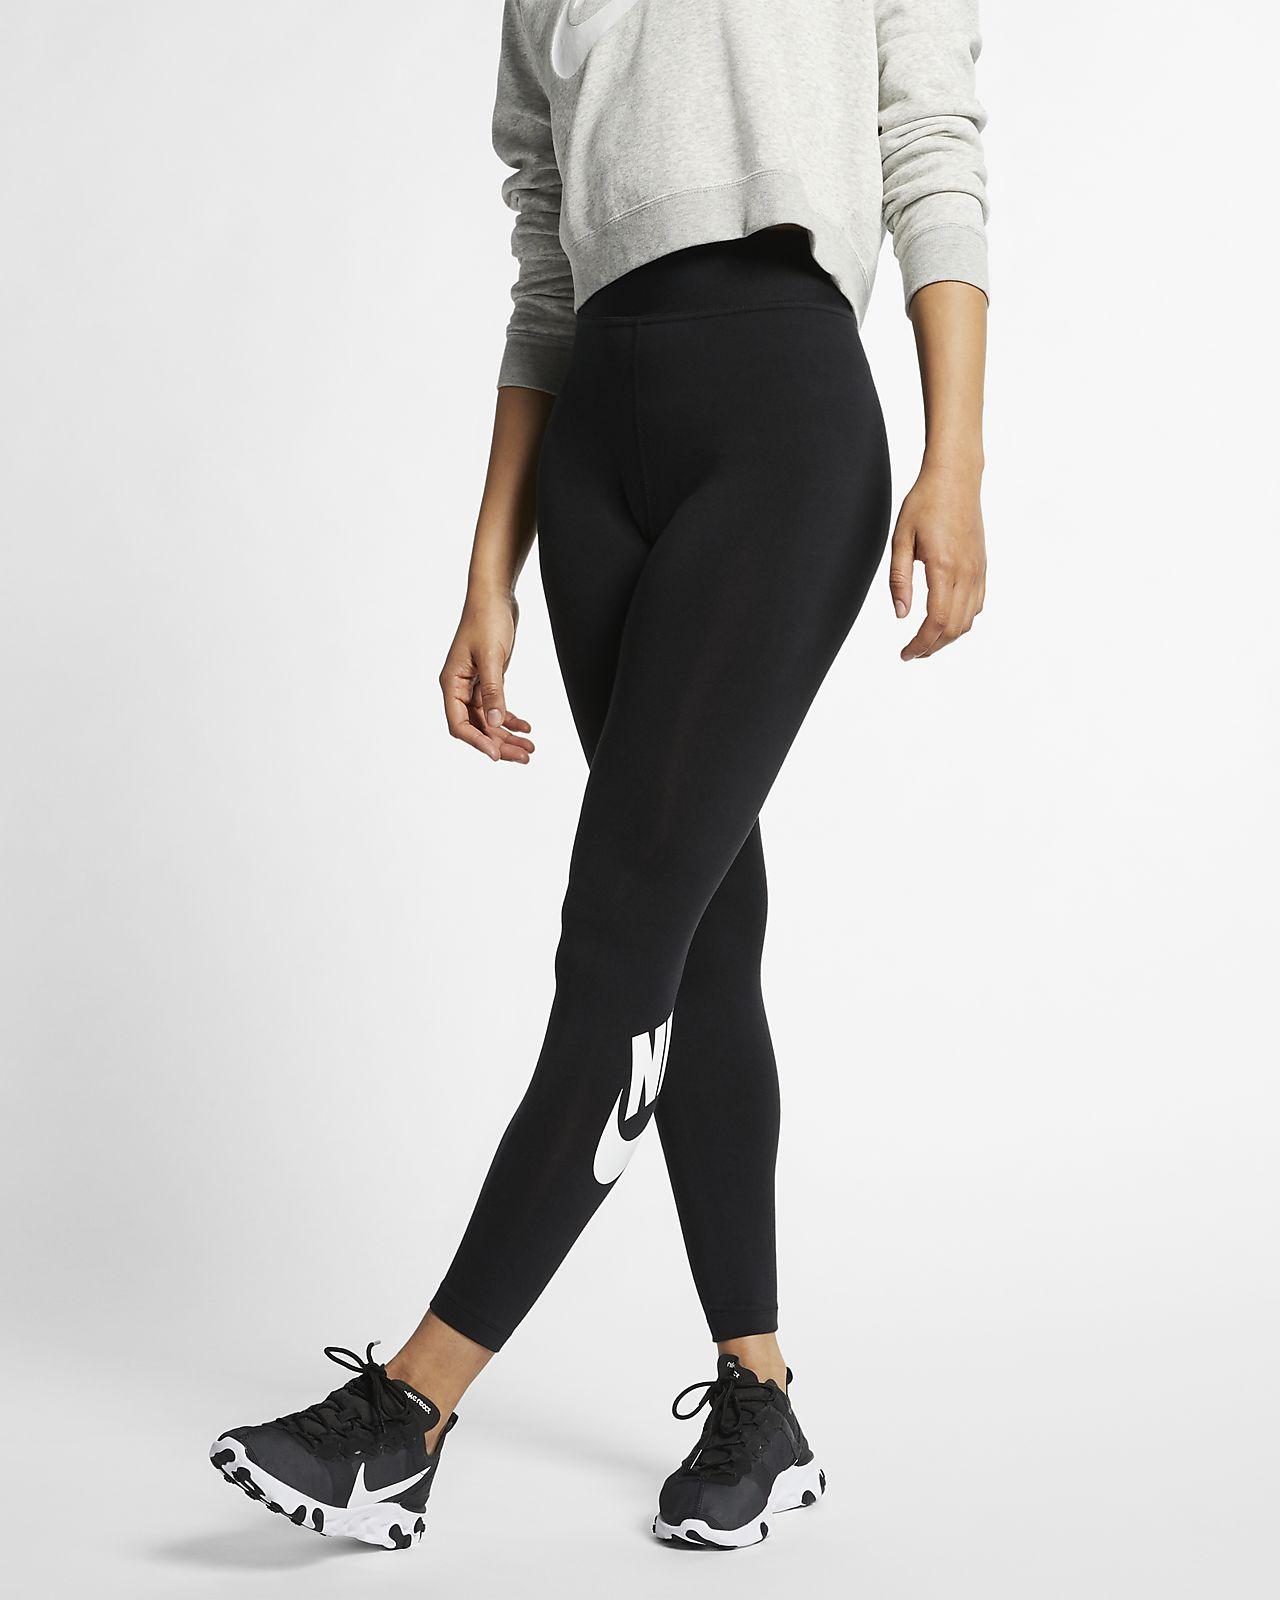 Nike Sportswear Leg-A-See 女款高腰內搭褲